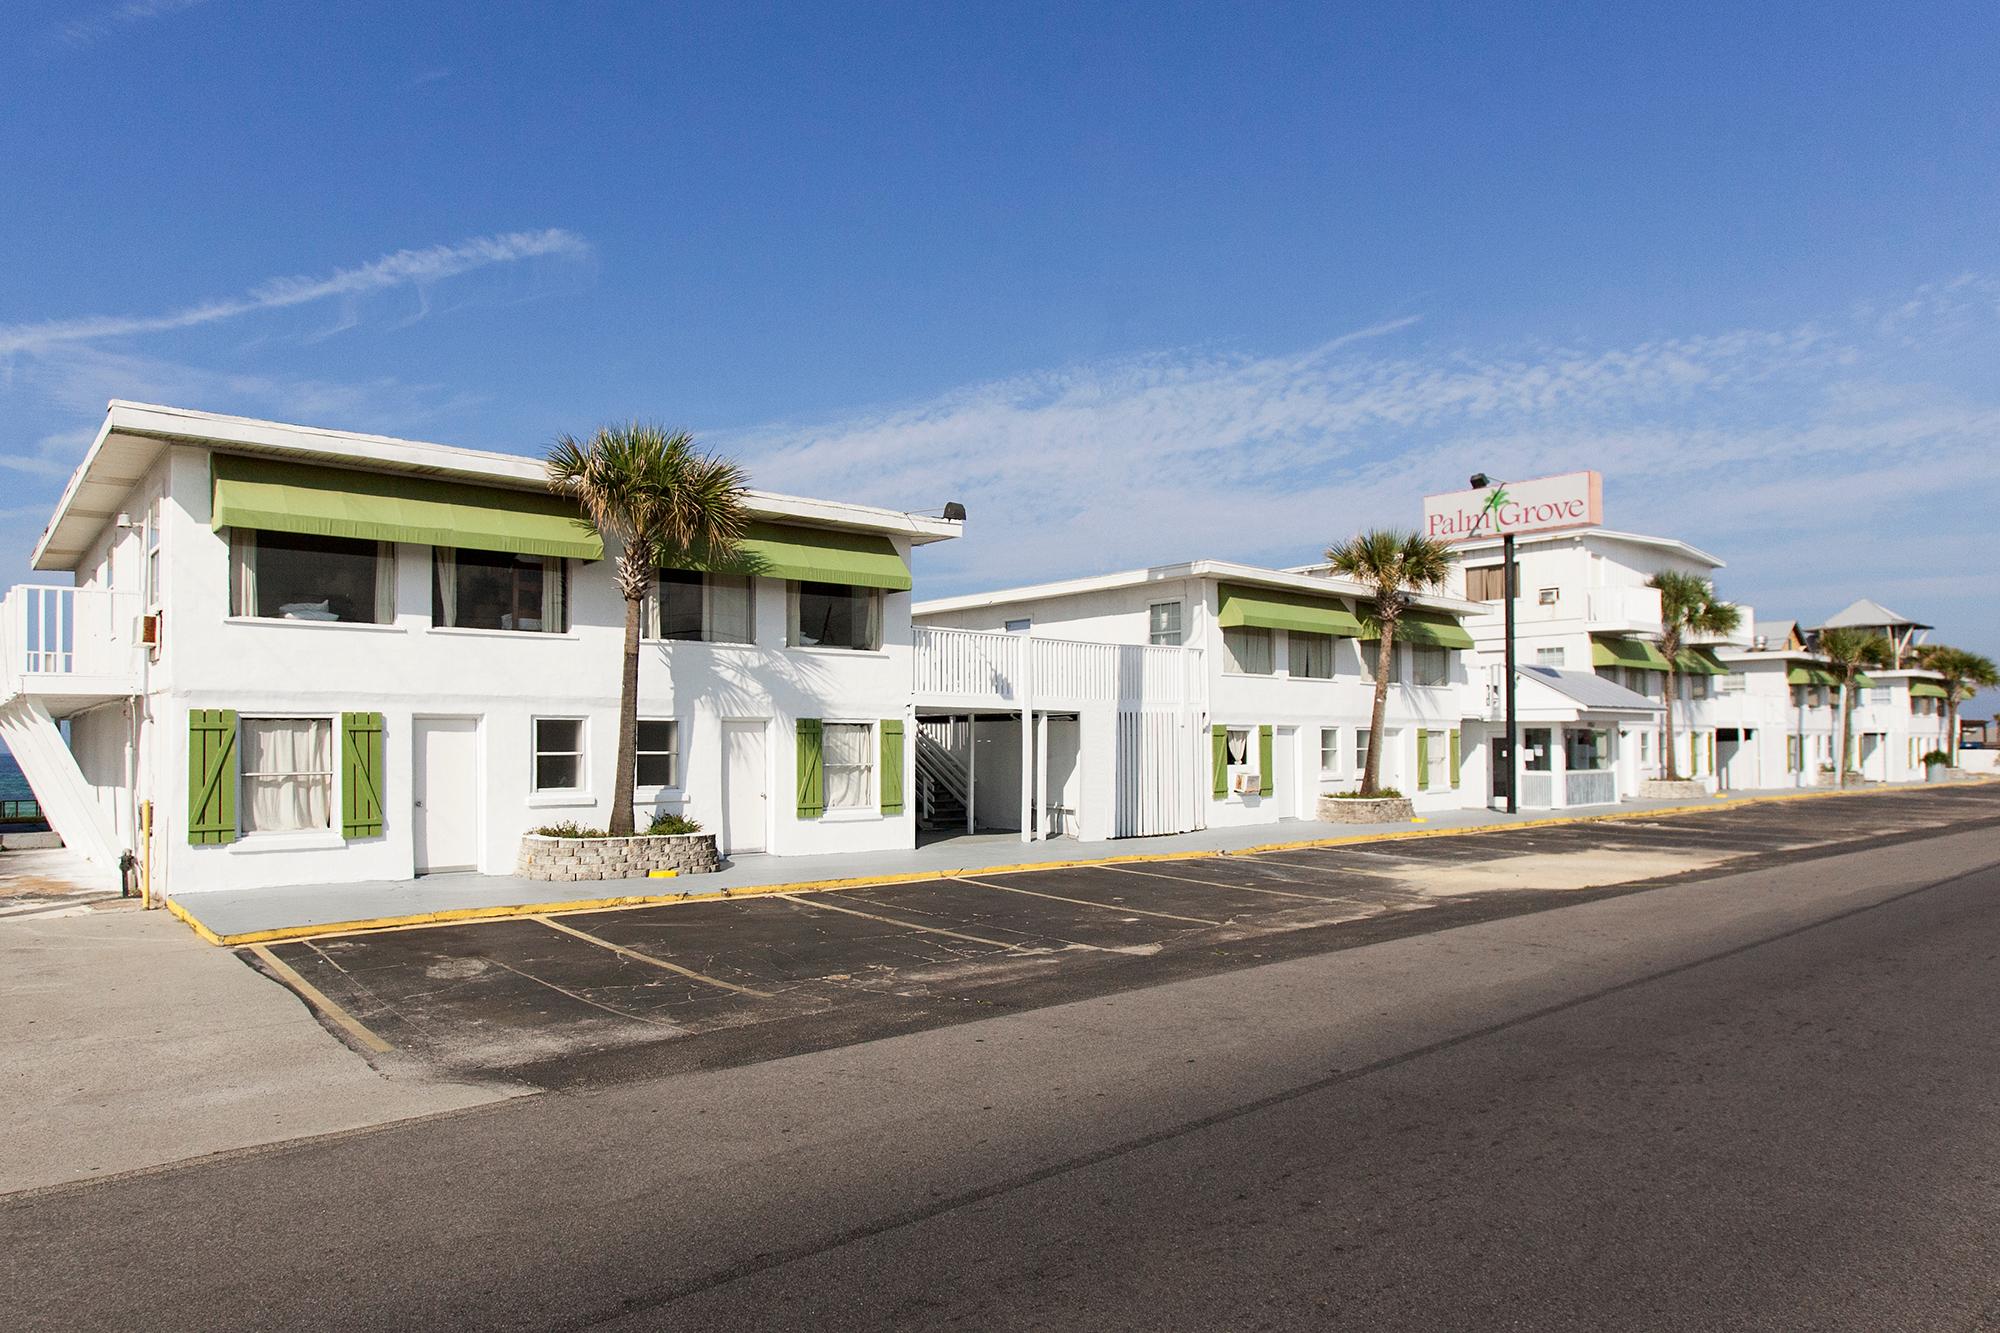 Palm Grove image 0